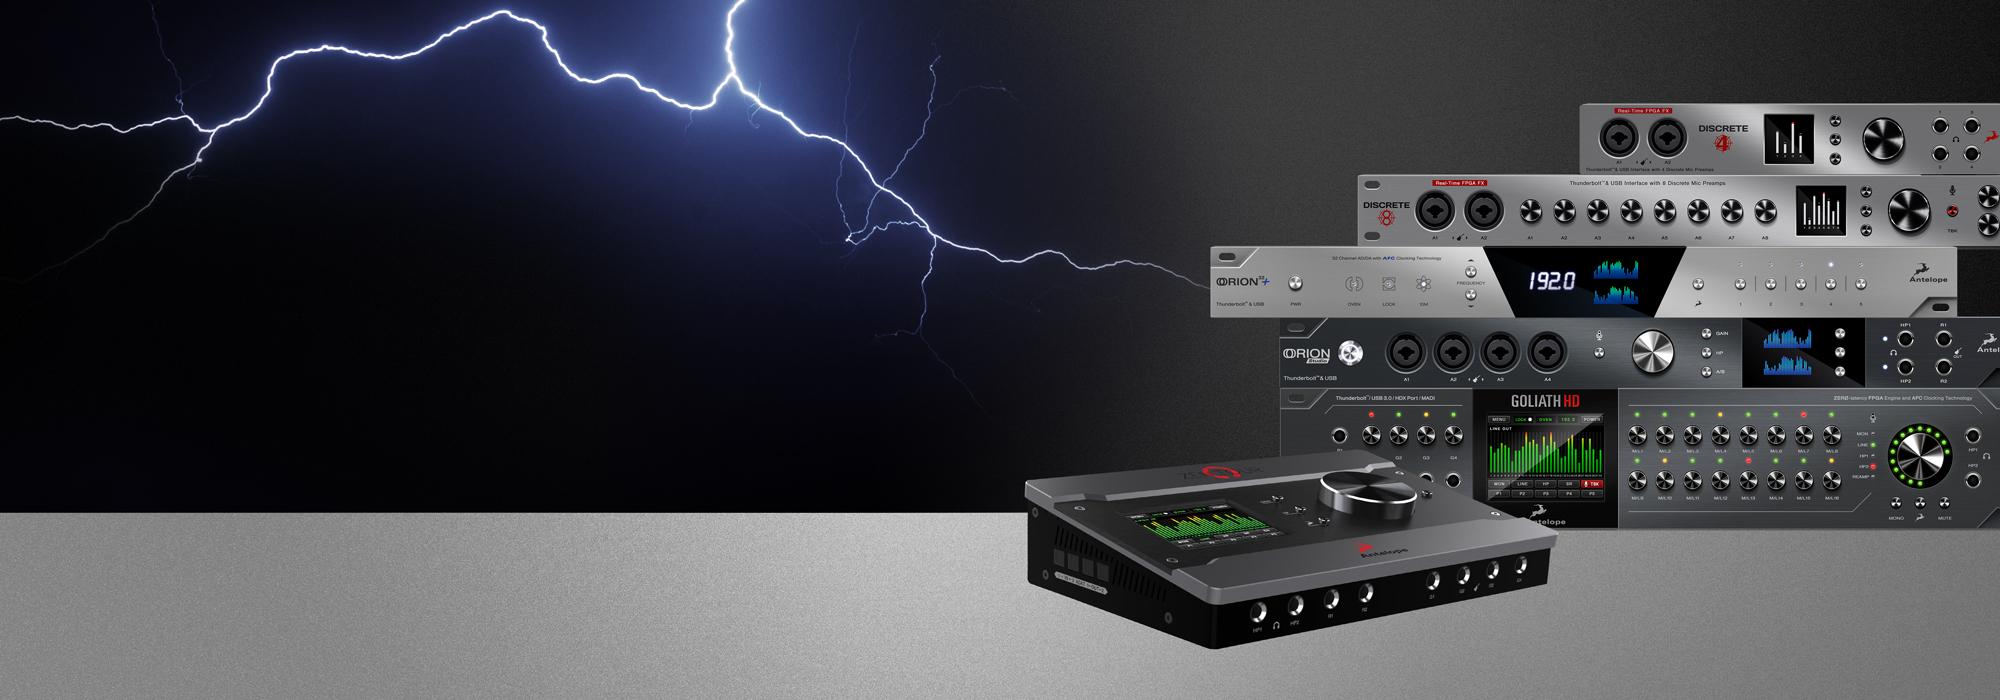 Antelope Audio Announces Thunderbolt Beta Driver For Windows Portable Live Sound Setup Gearslutz Pro Community